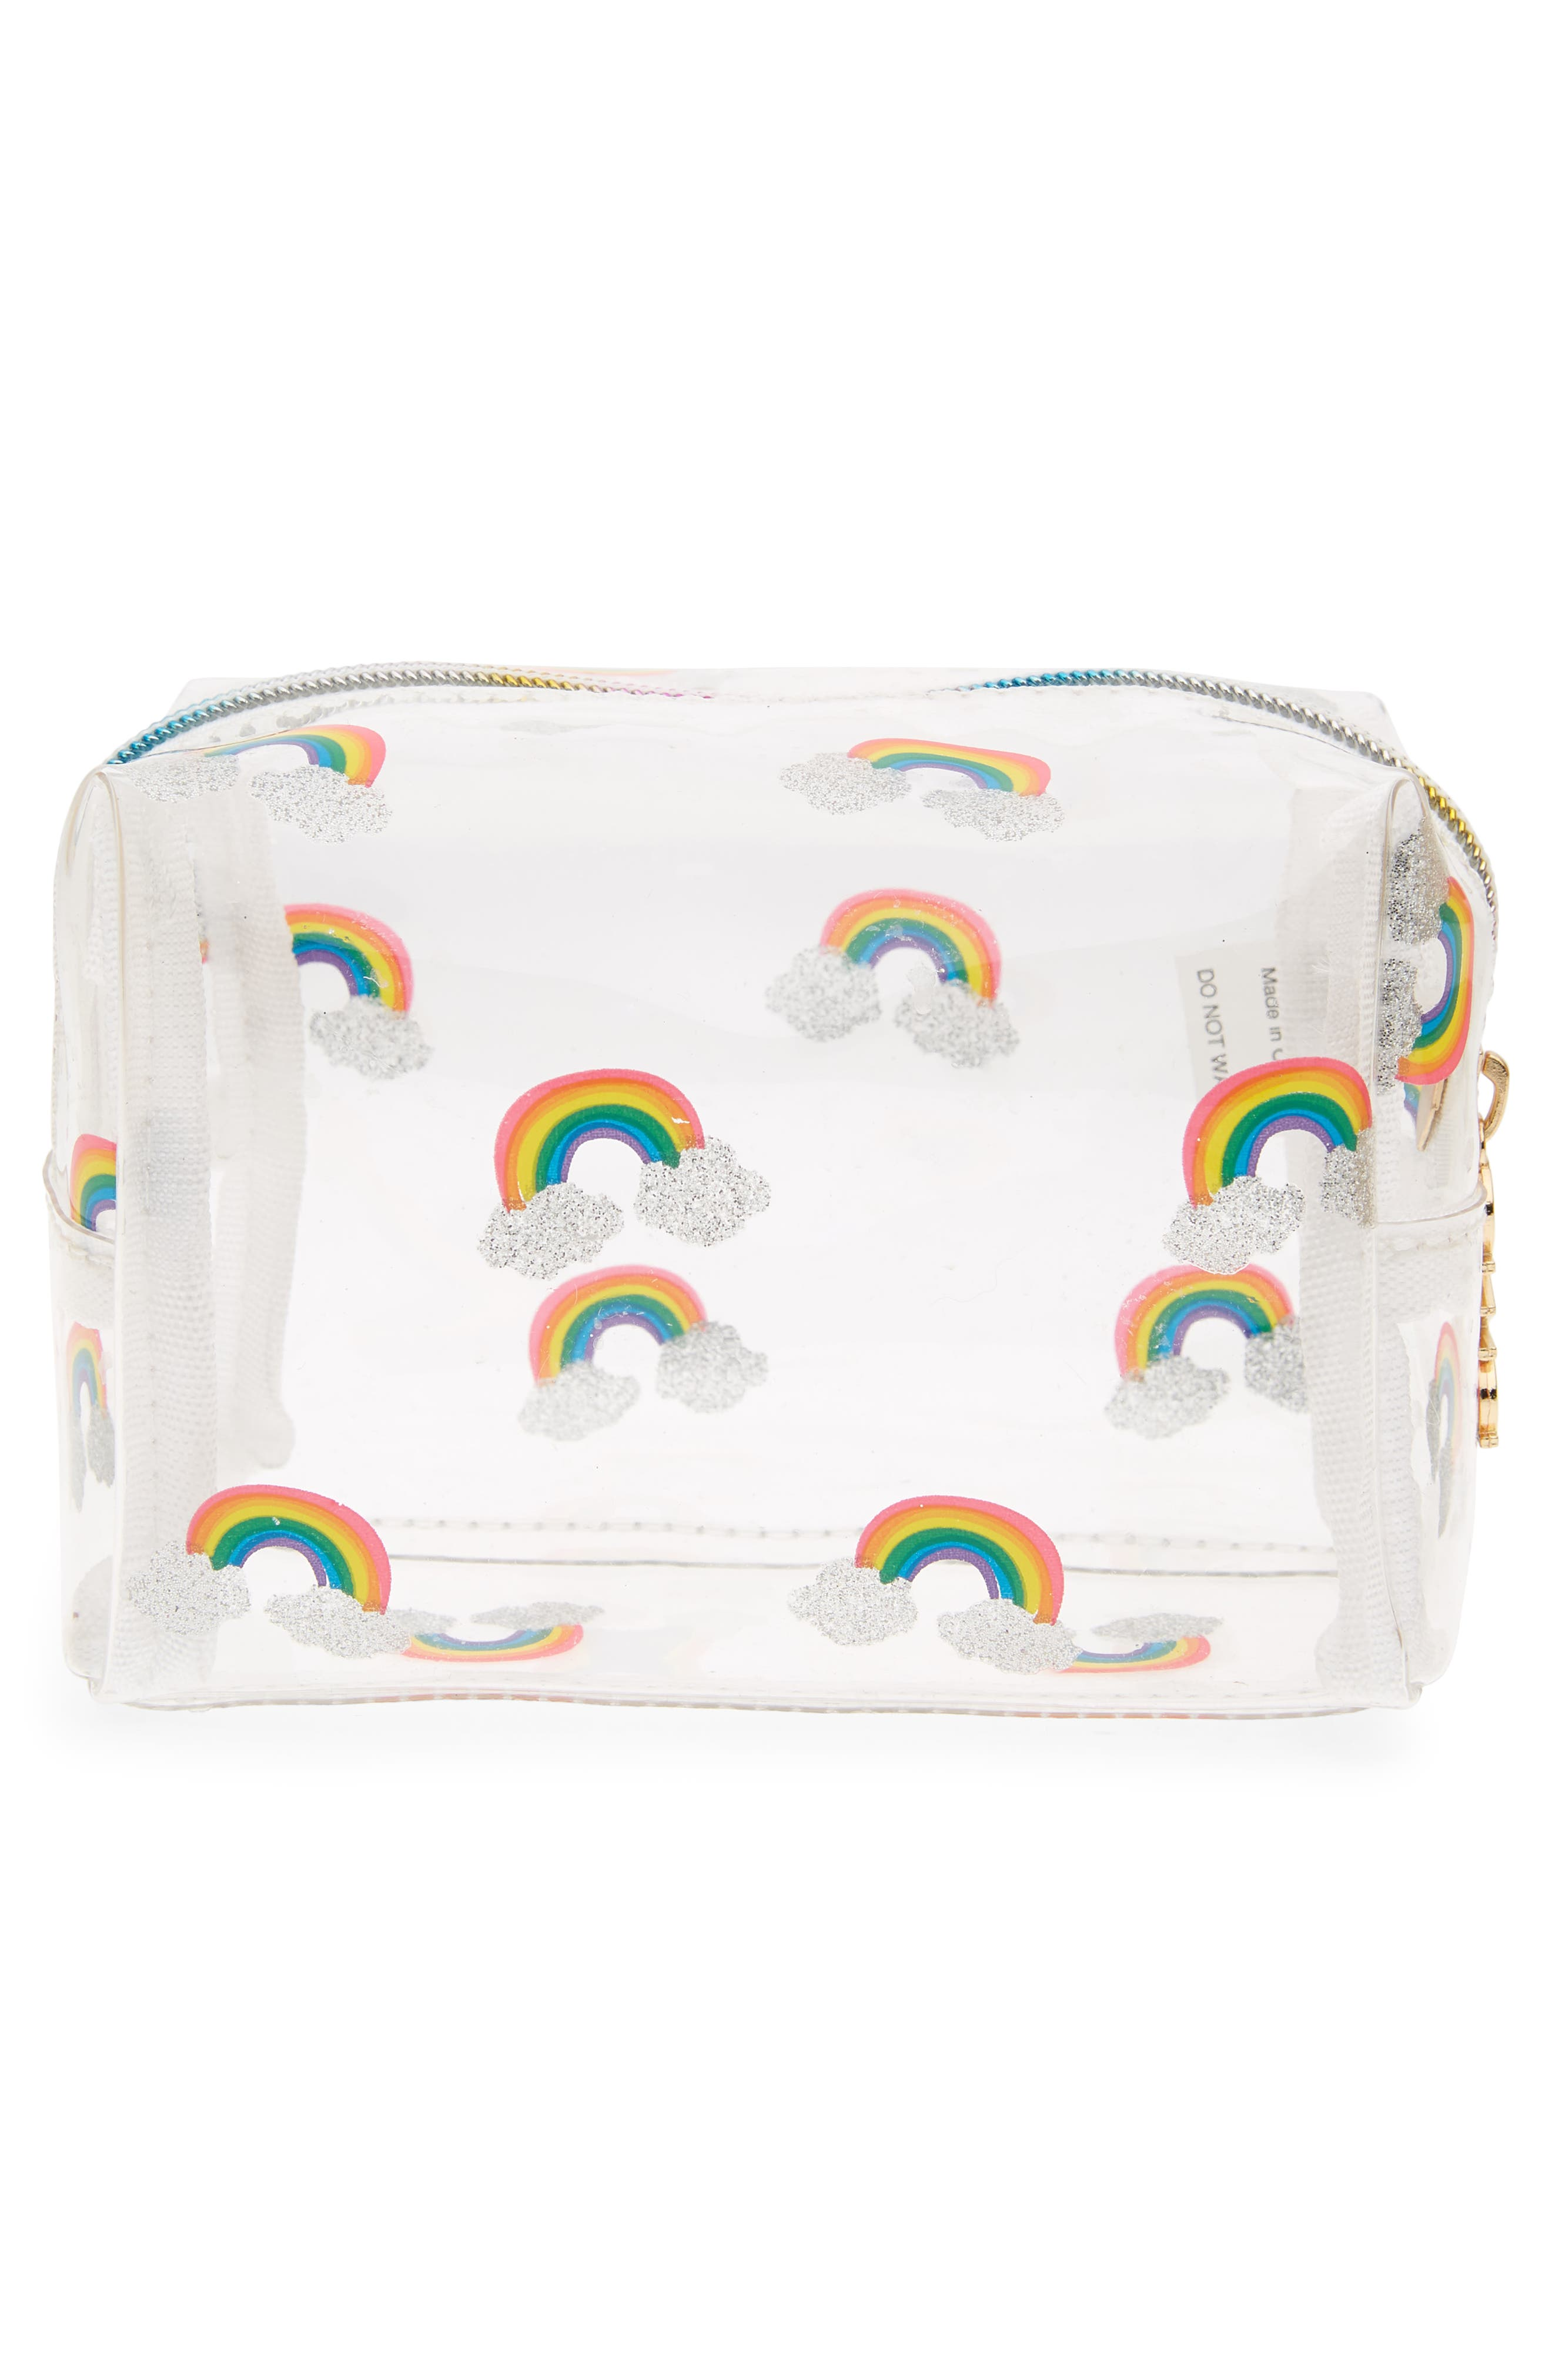 Rainbow Cosmetics Bag,                             Alternate thumbnail 2, color,                             Multi